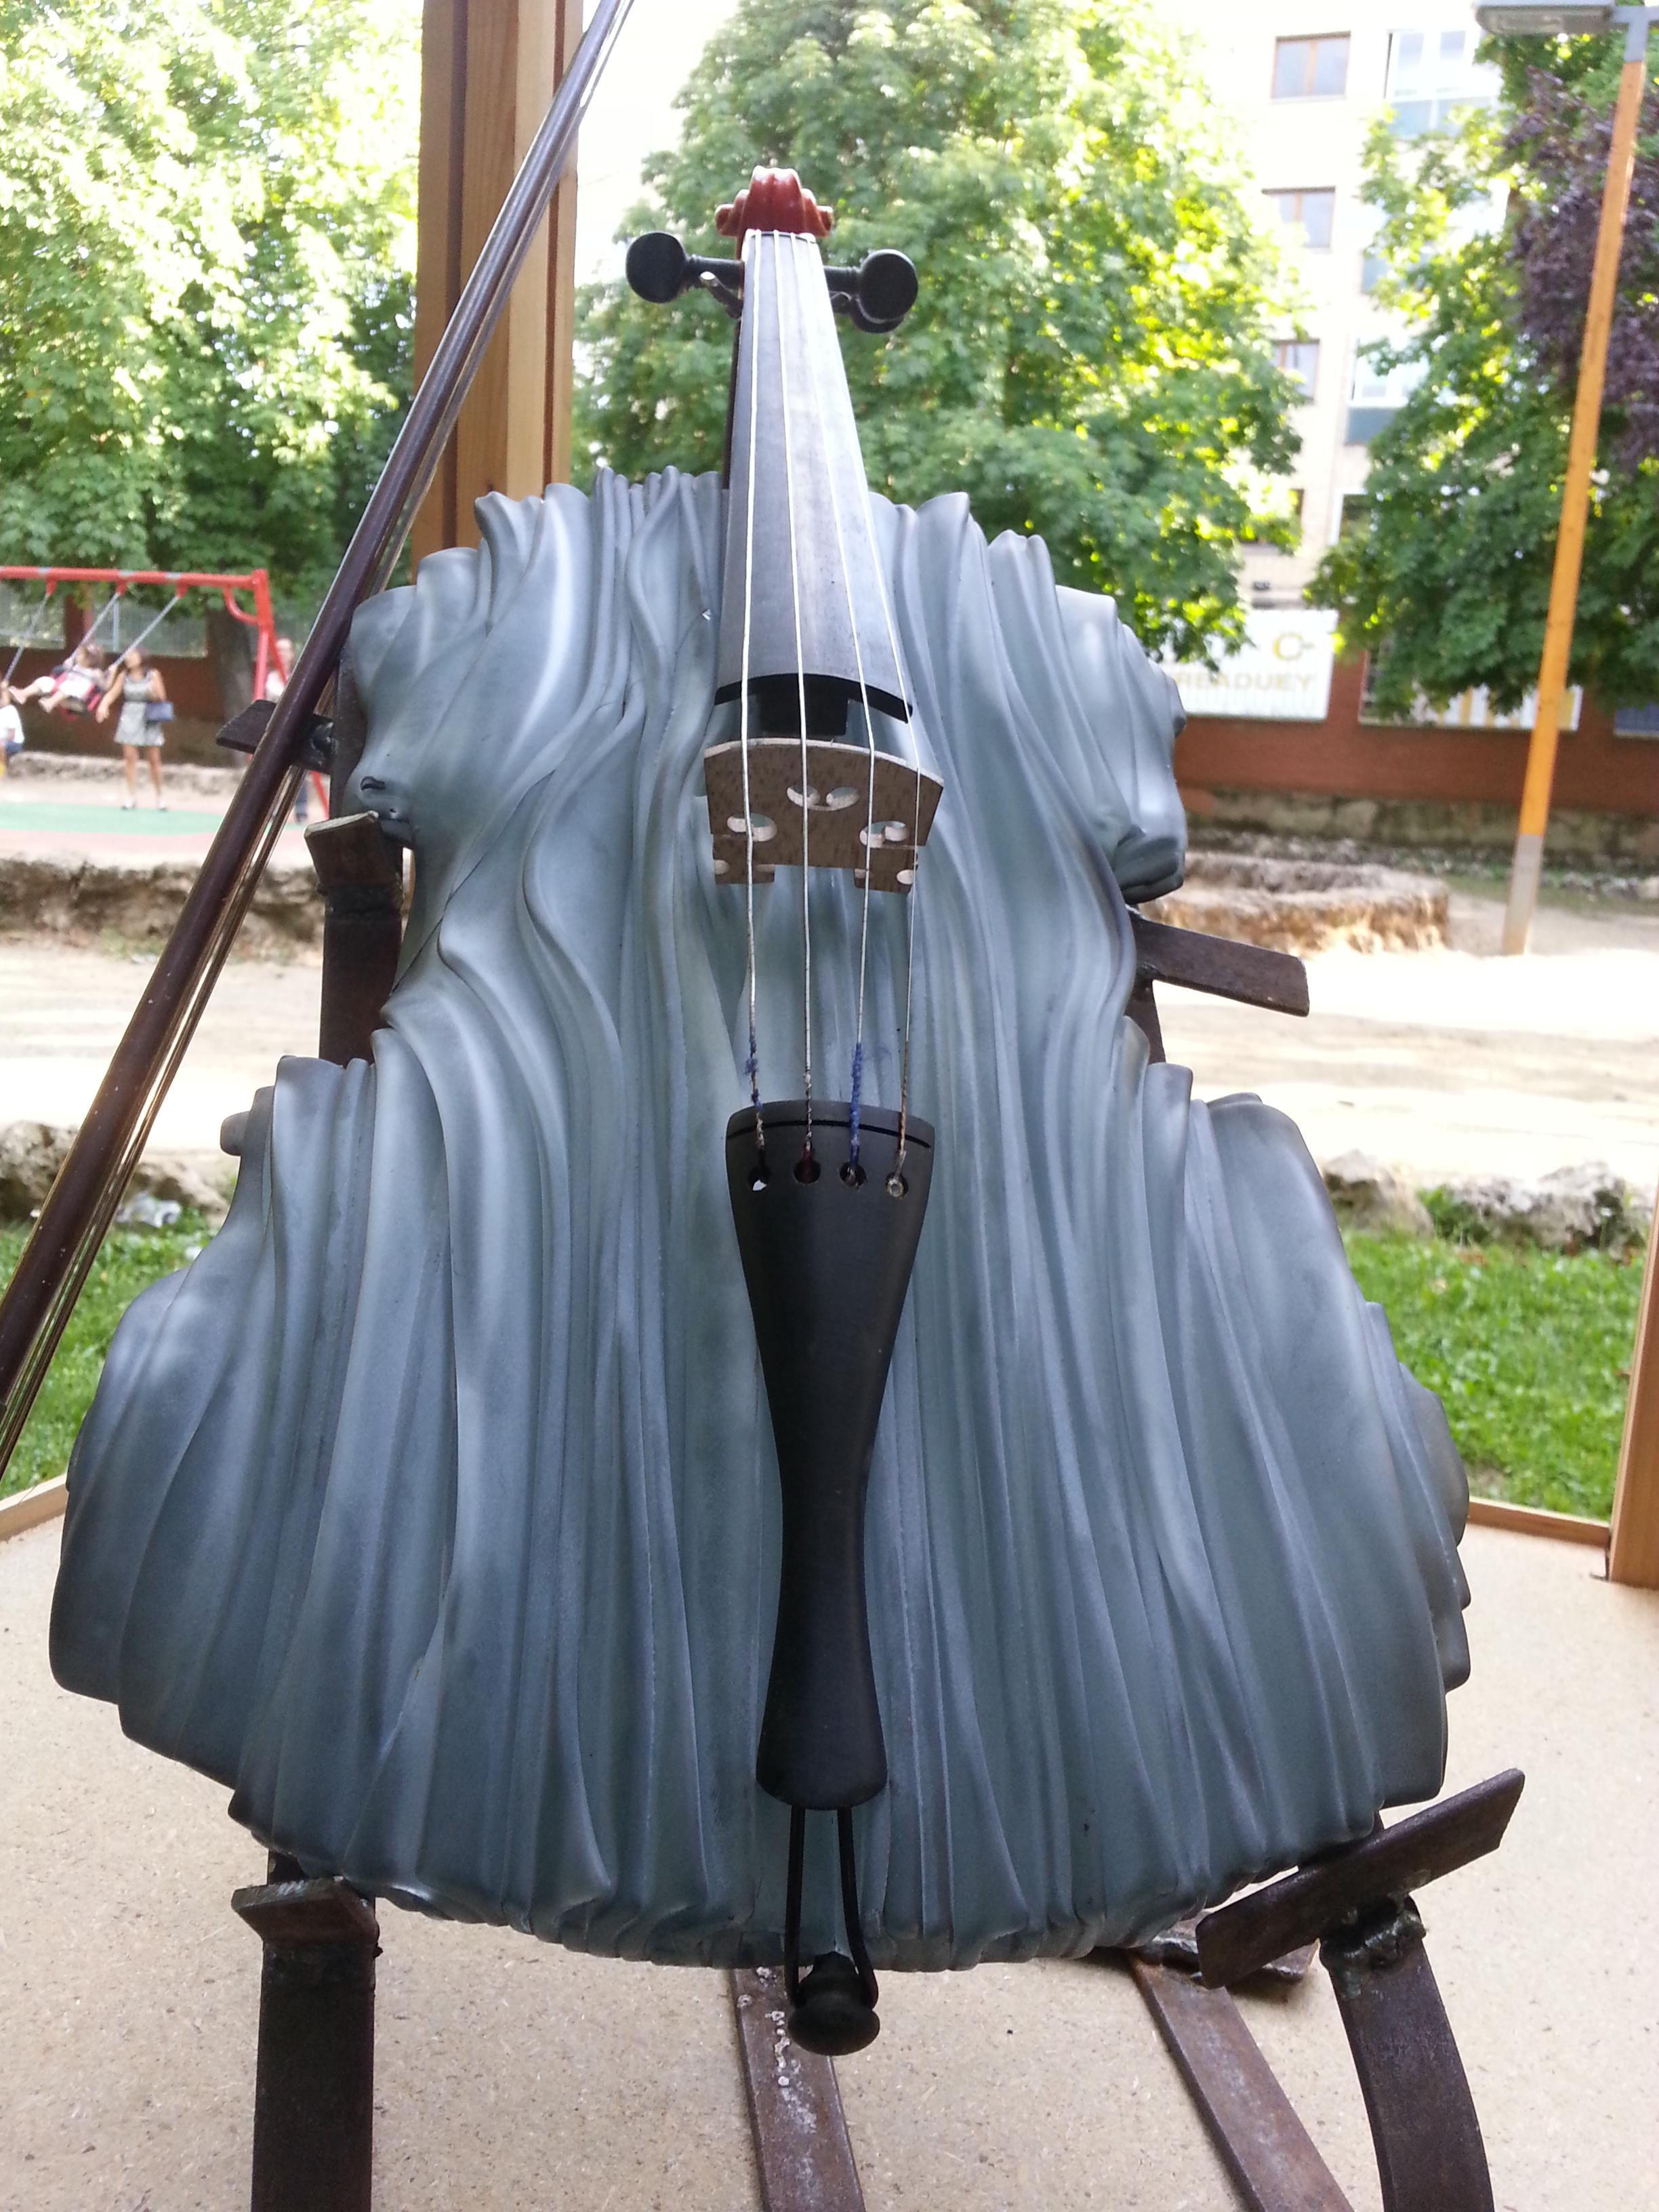 violin_vidrio_cristal_2